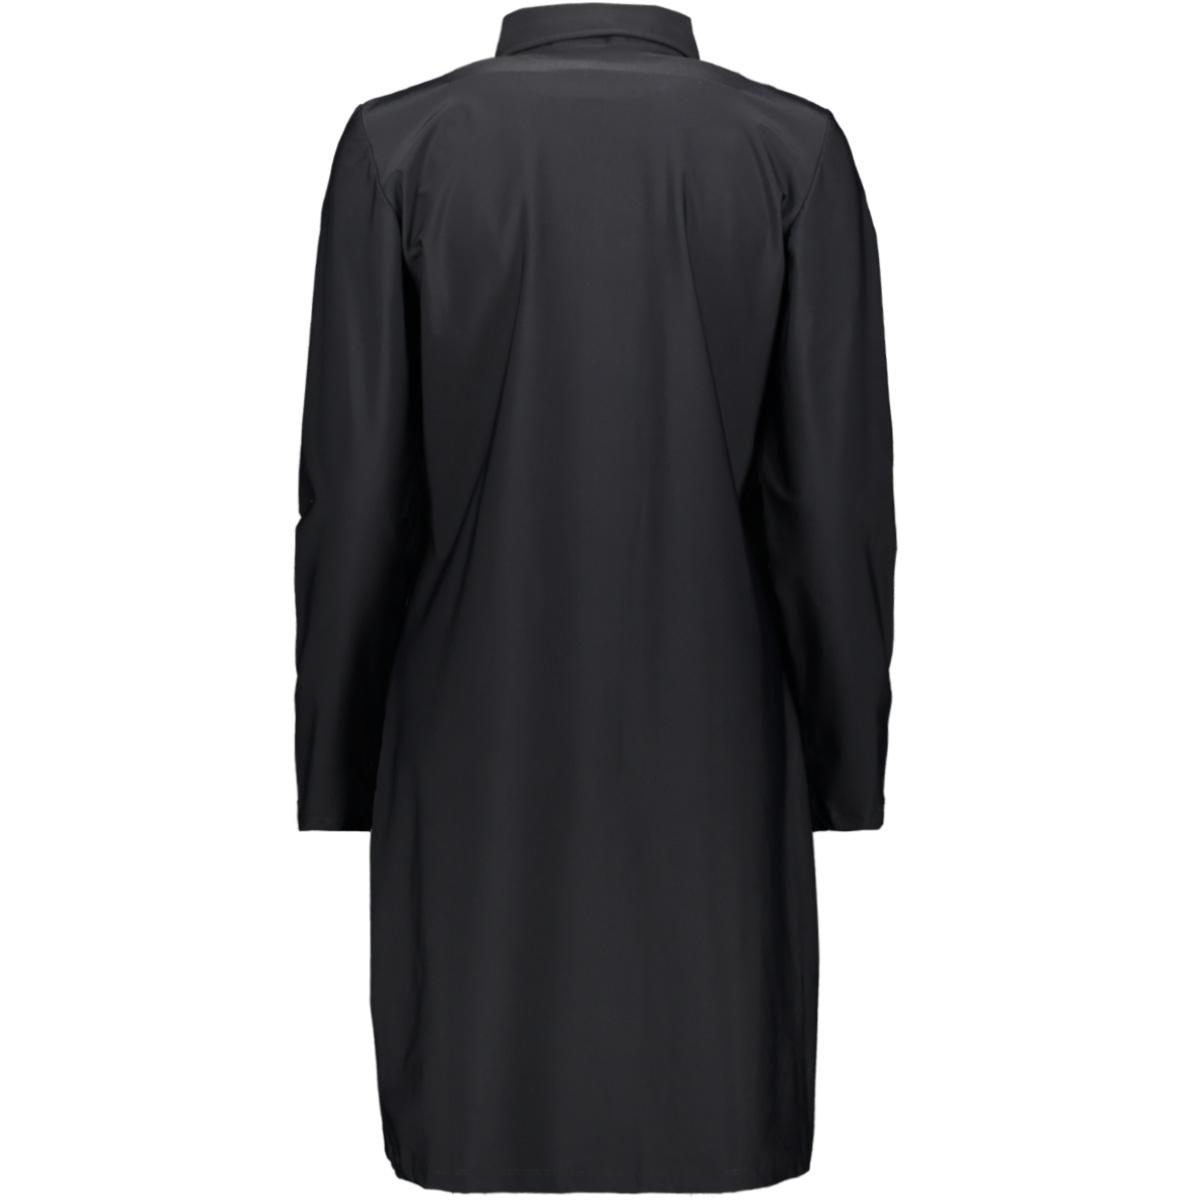 terry winter  long blouse 195 zoso jurk black